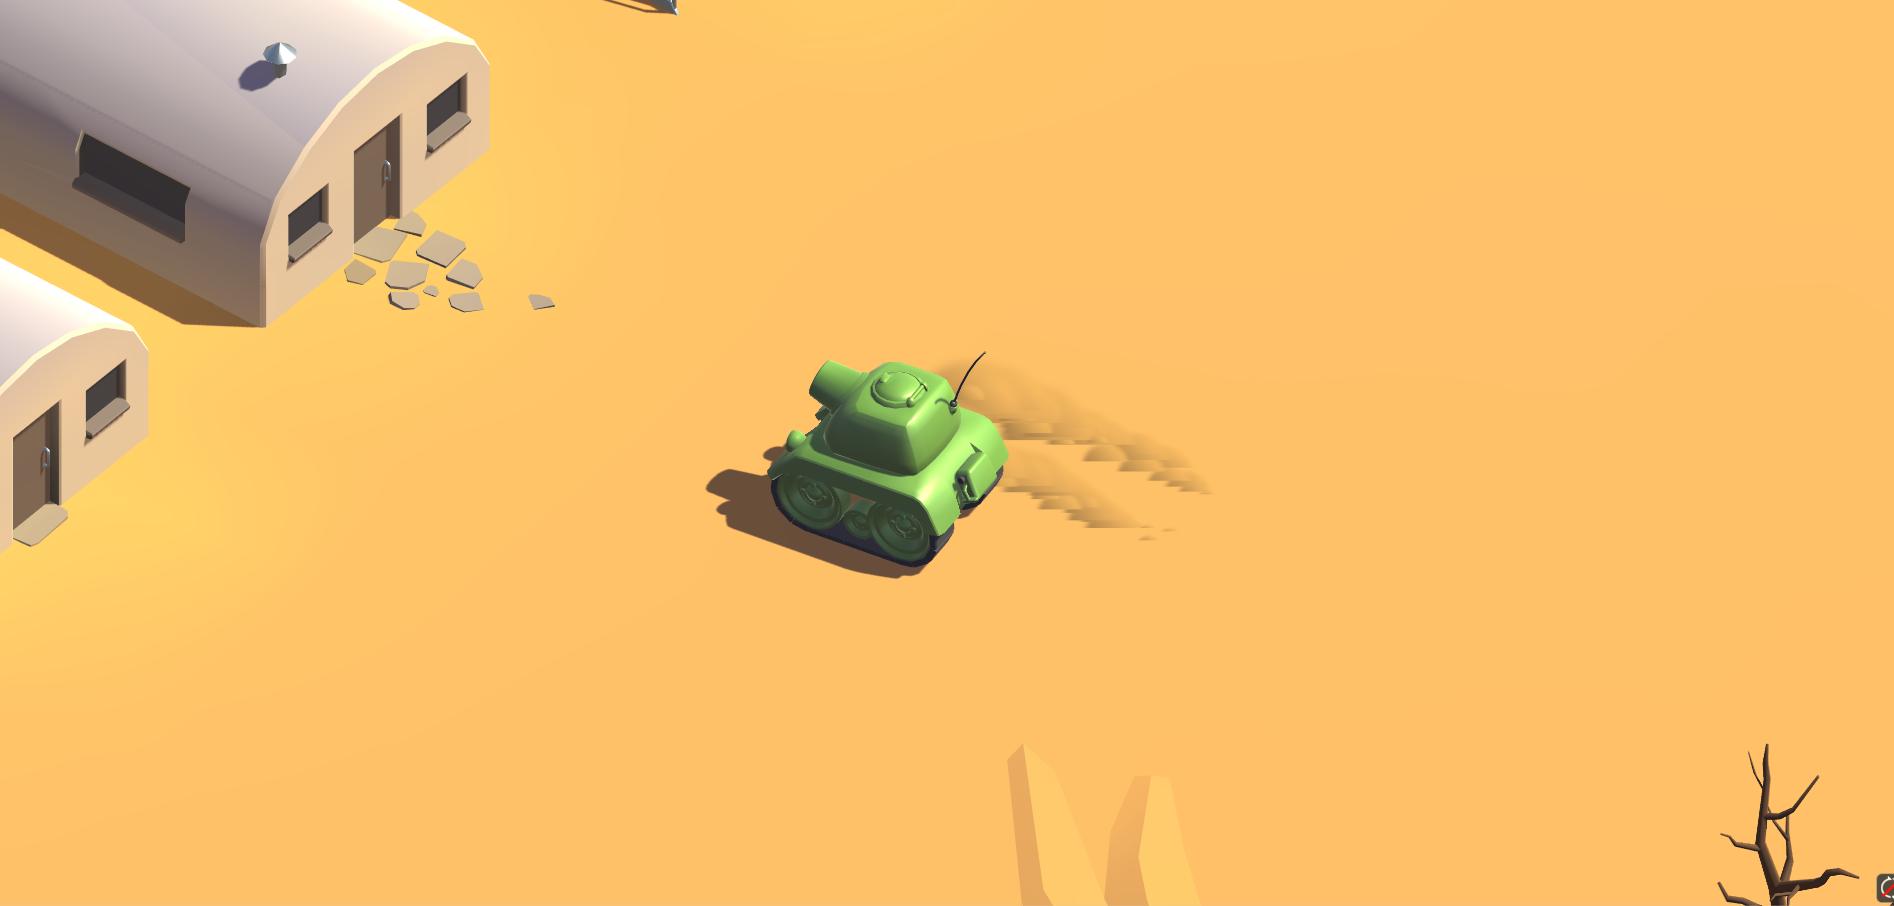 123 teach me tank game - Tank Png